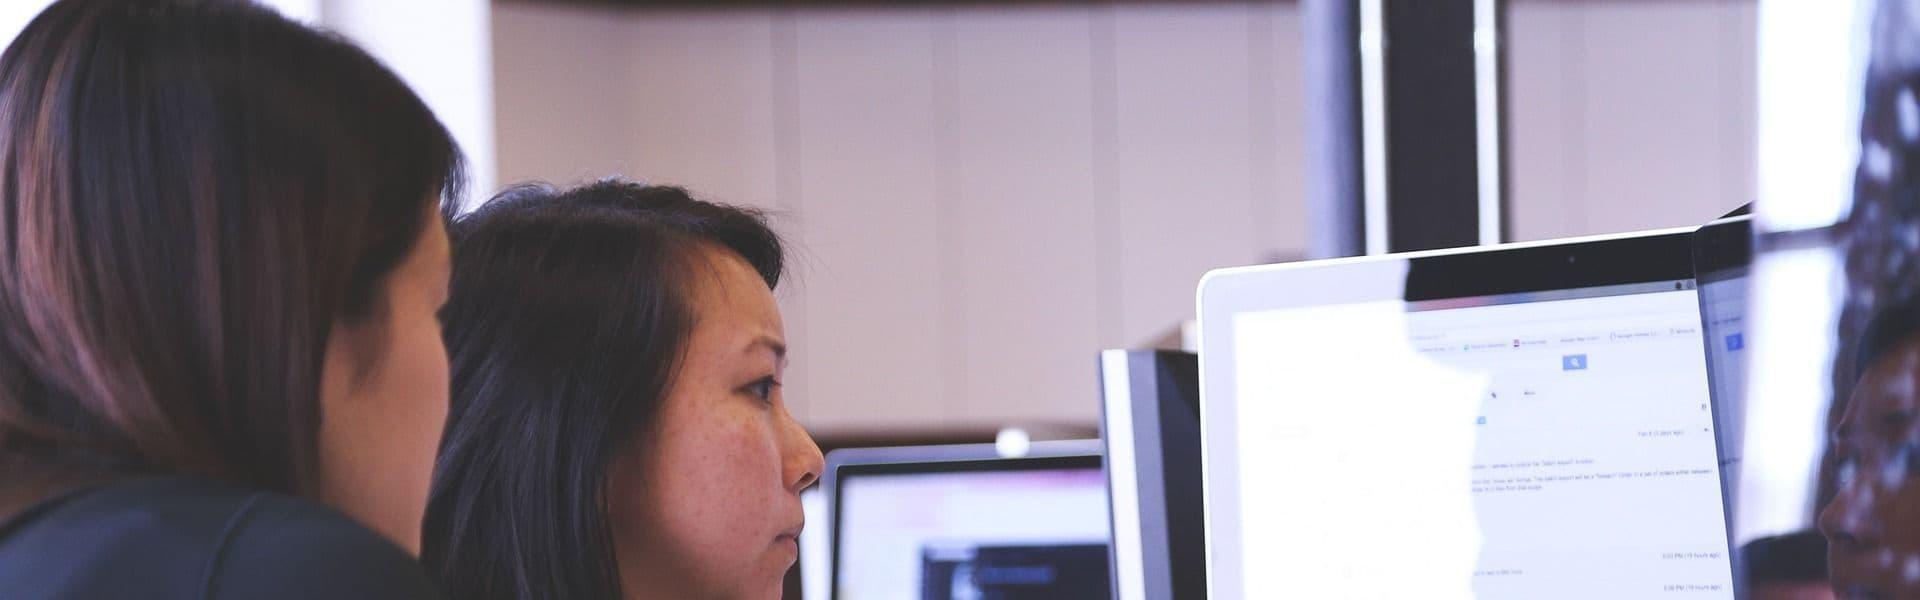 Trainerin hilft Teilnehmerin bei Training ob the Job an ihrem Computer